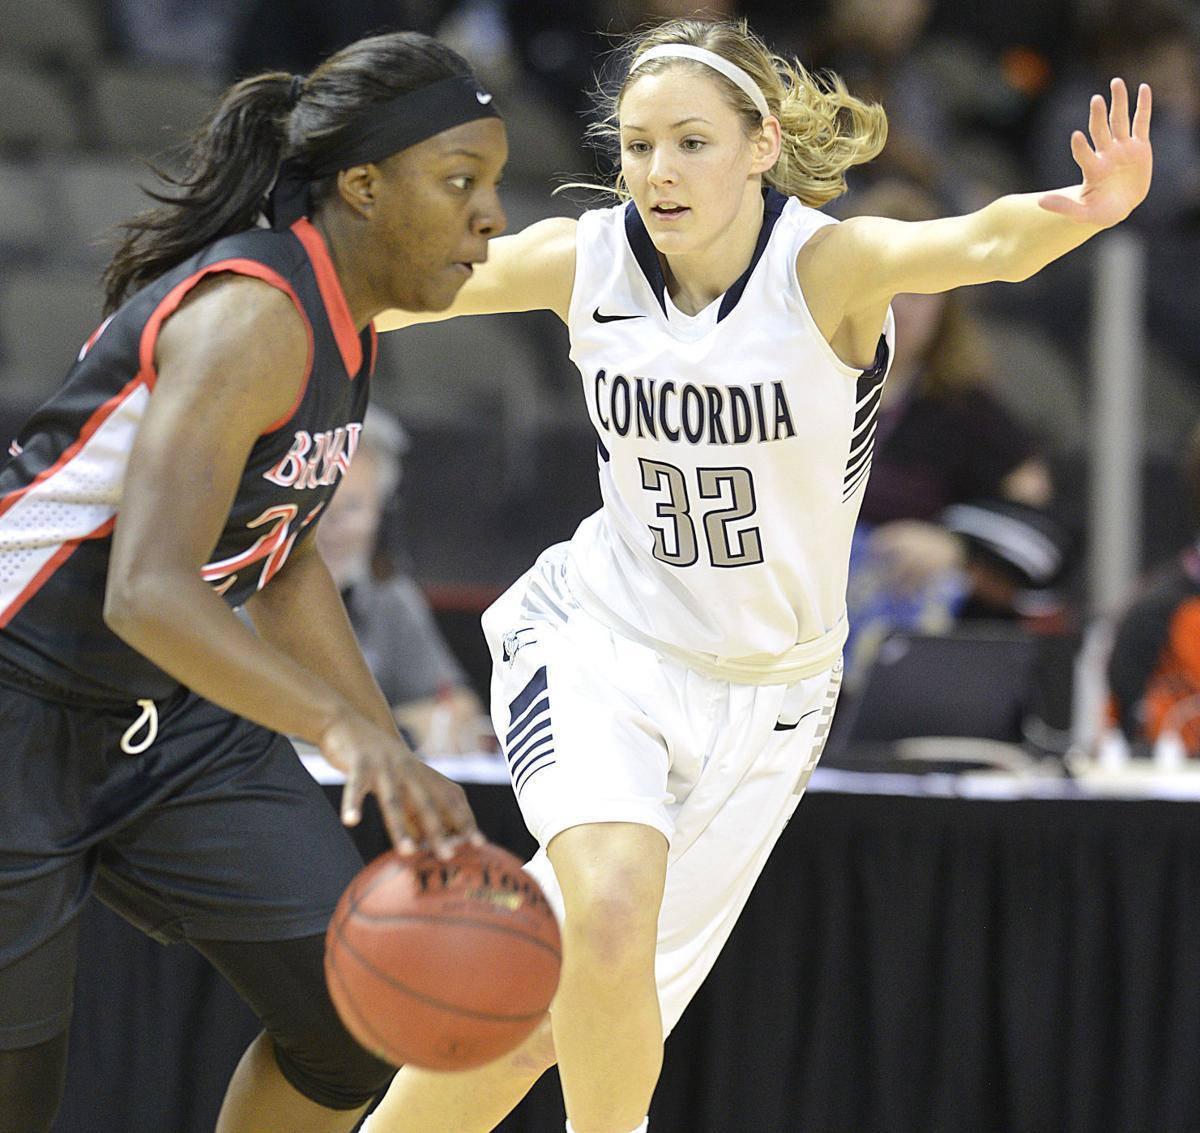 Concordia vs Bryan NAIA basketball